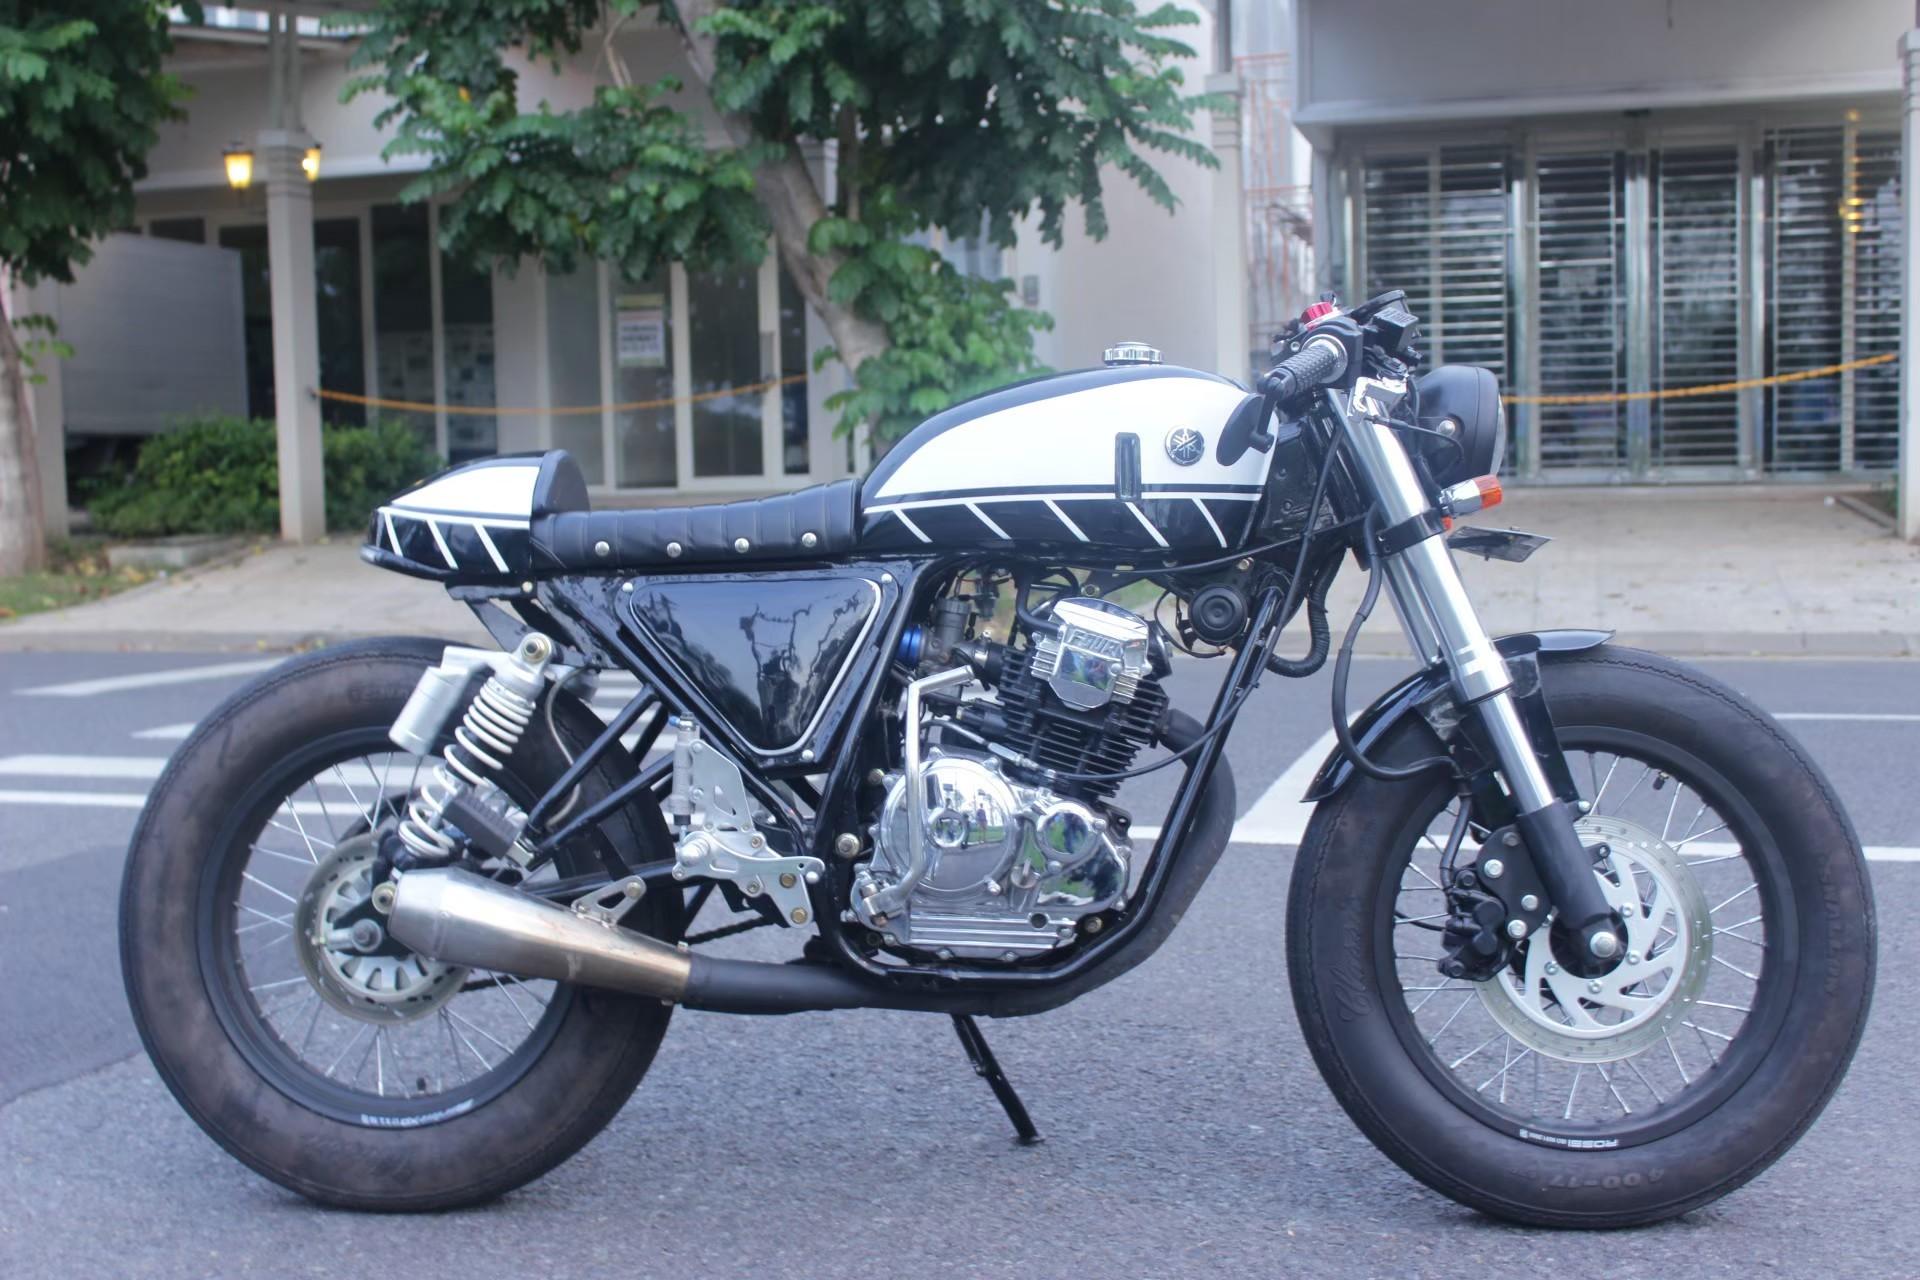 Yamaha Scorpio custom cafe racer